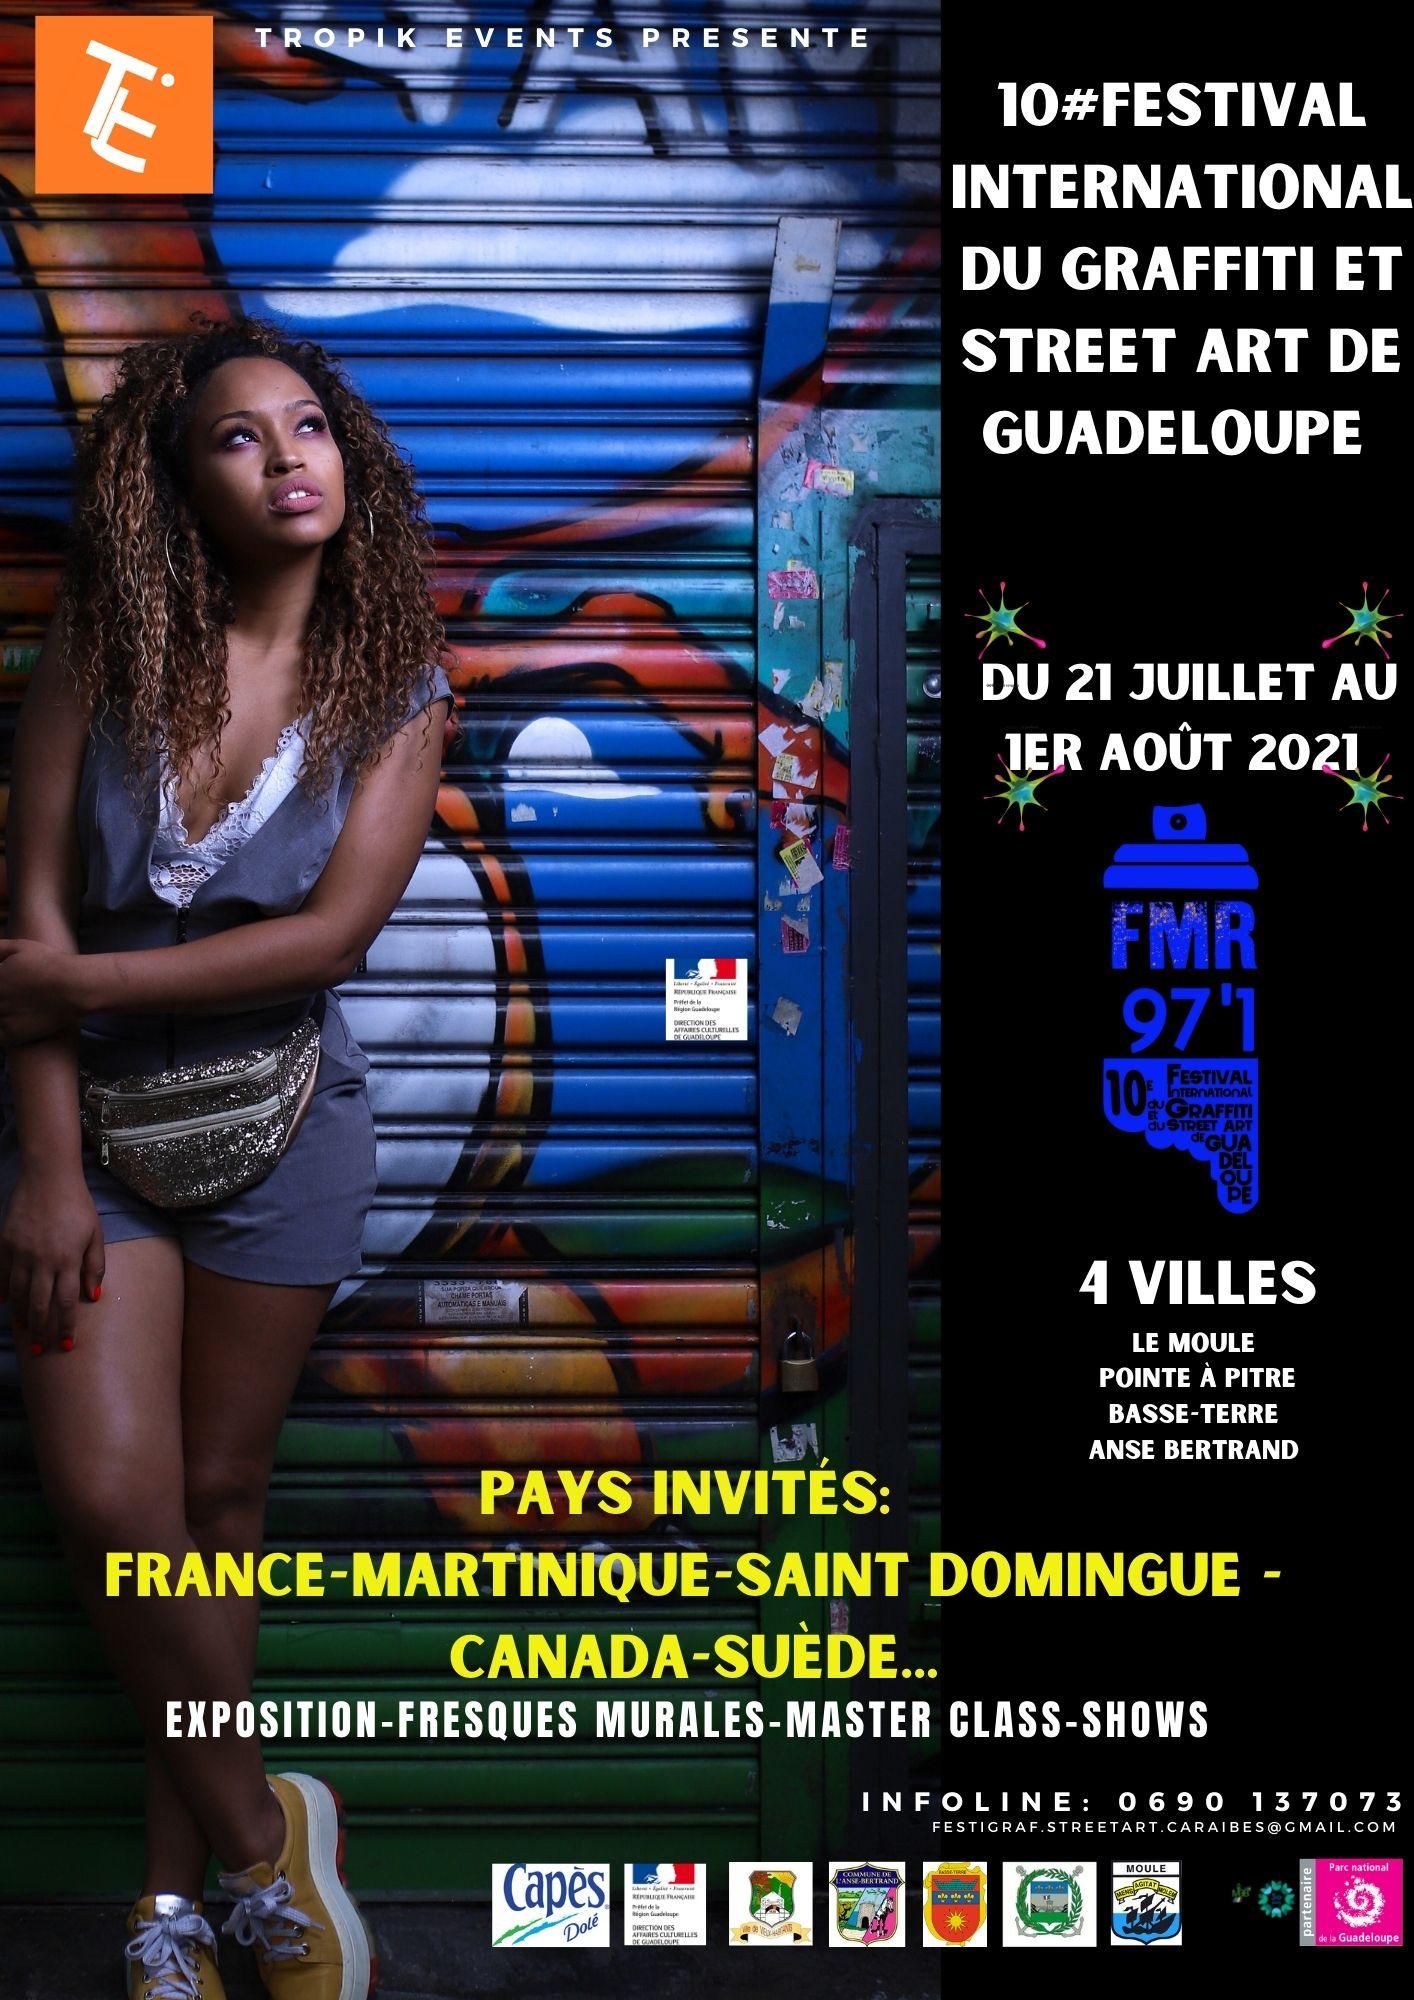 10 eme Festival international du Graffiti et Street art de la Guadeloupe